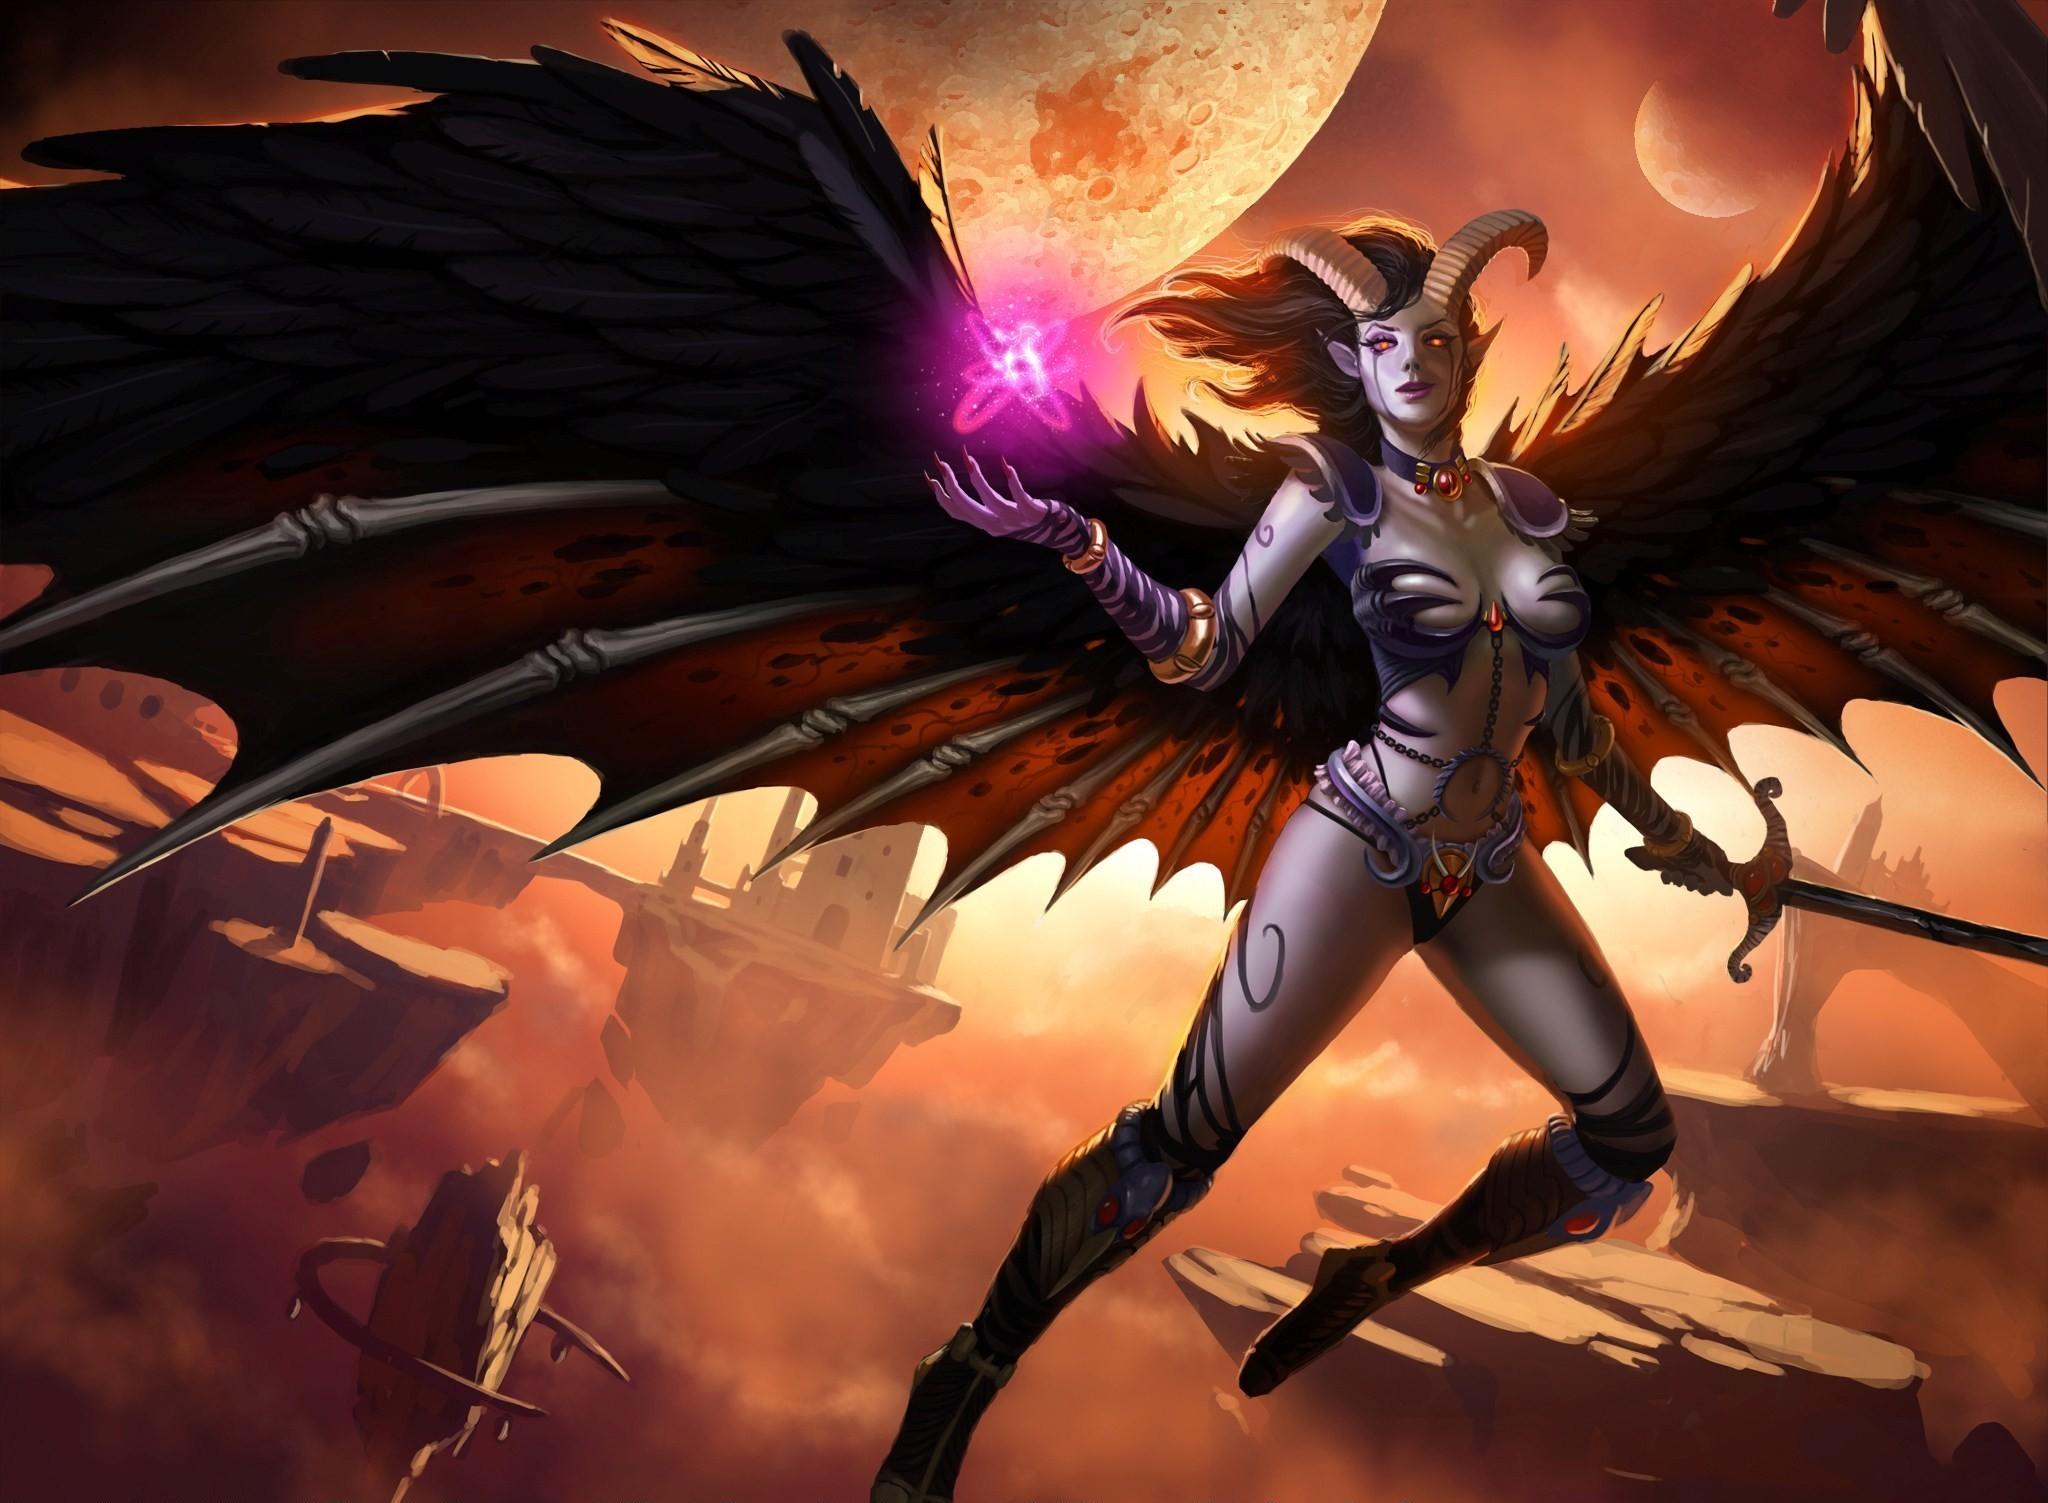 General 2048x1503 realistic devils wings fantasy art succubus Queen of Pain magic demon girls video game art video game girls Dota 2 horns legs boobs fantasy girl